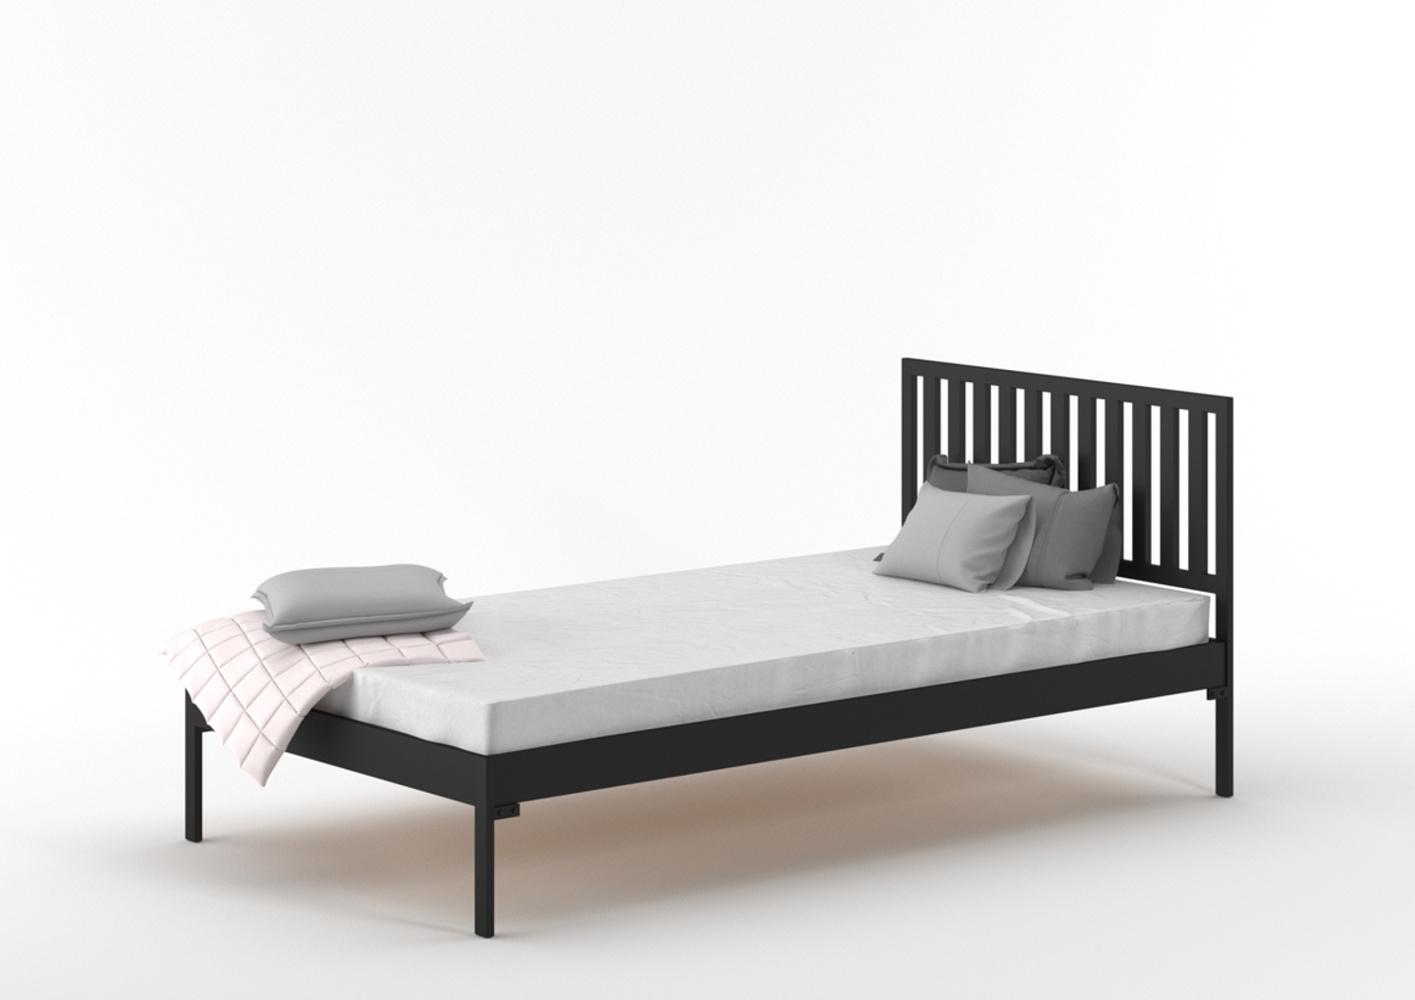 Łóżko metalowe Scandi II (wzór 34) szerokość 80-100 cm